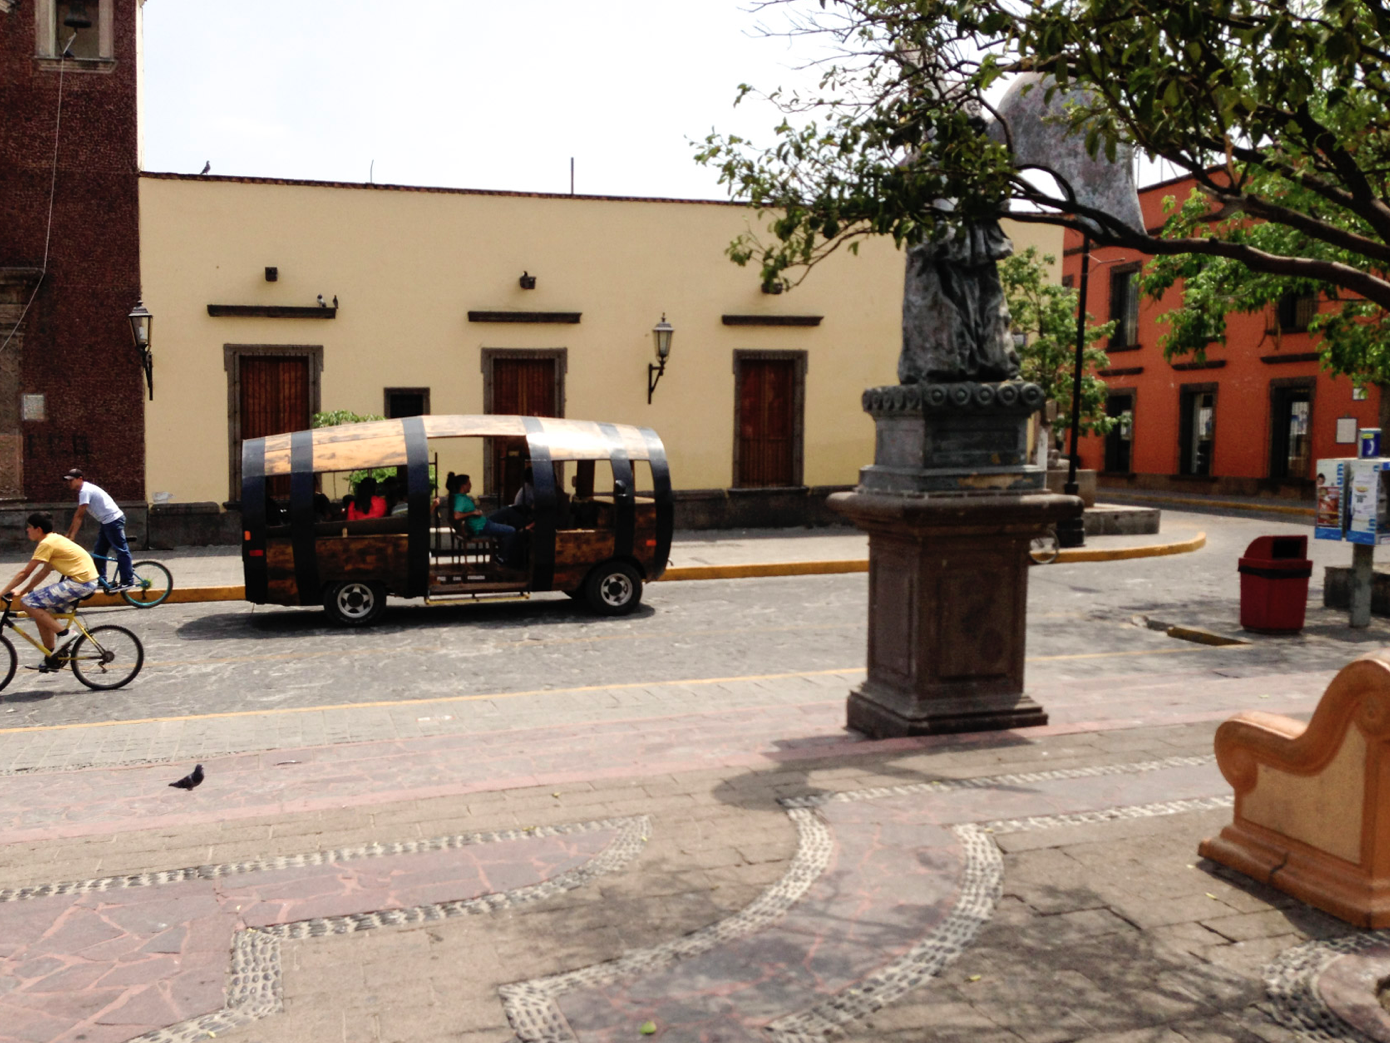 Tidbits of Tequila, Mexico via www.surelysimple.com